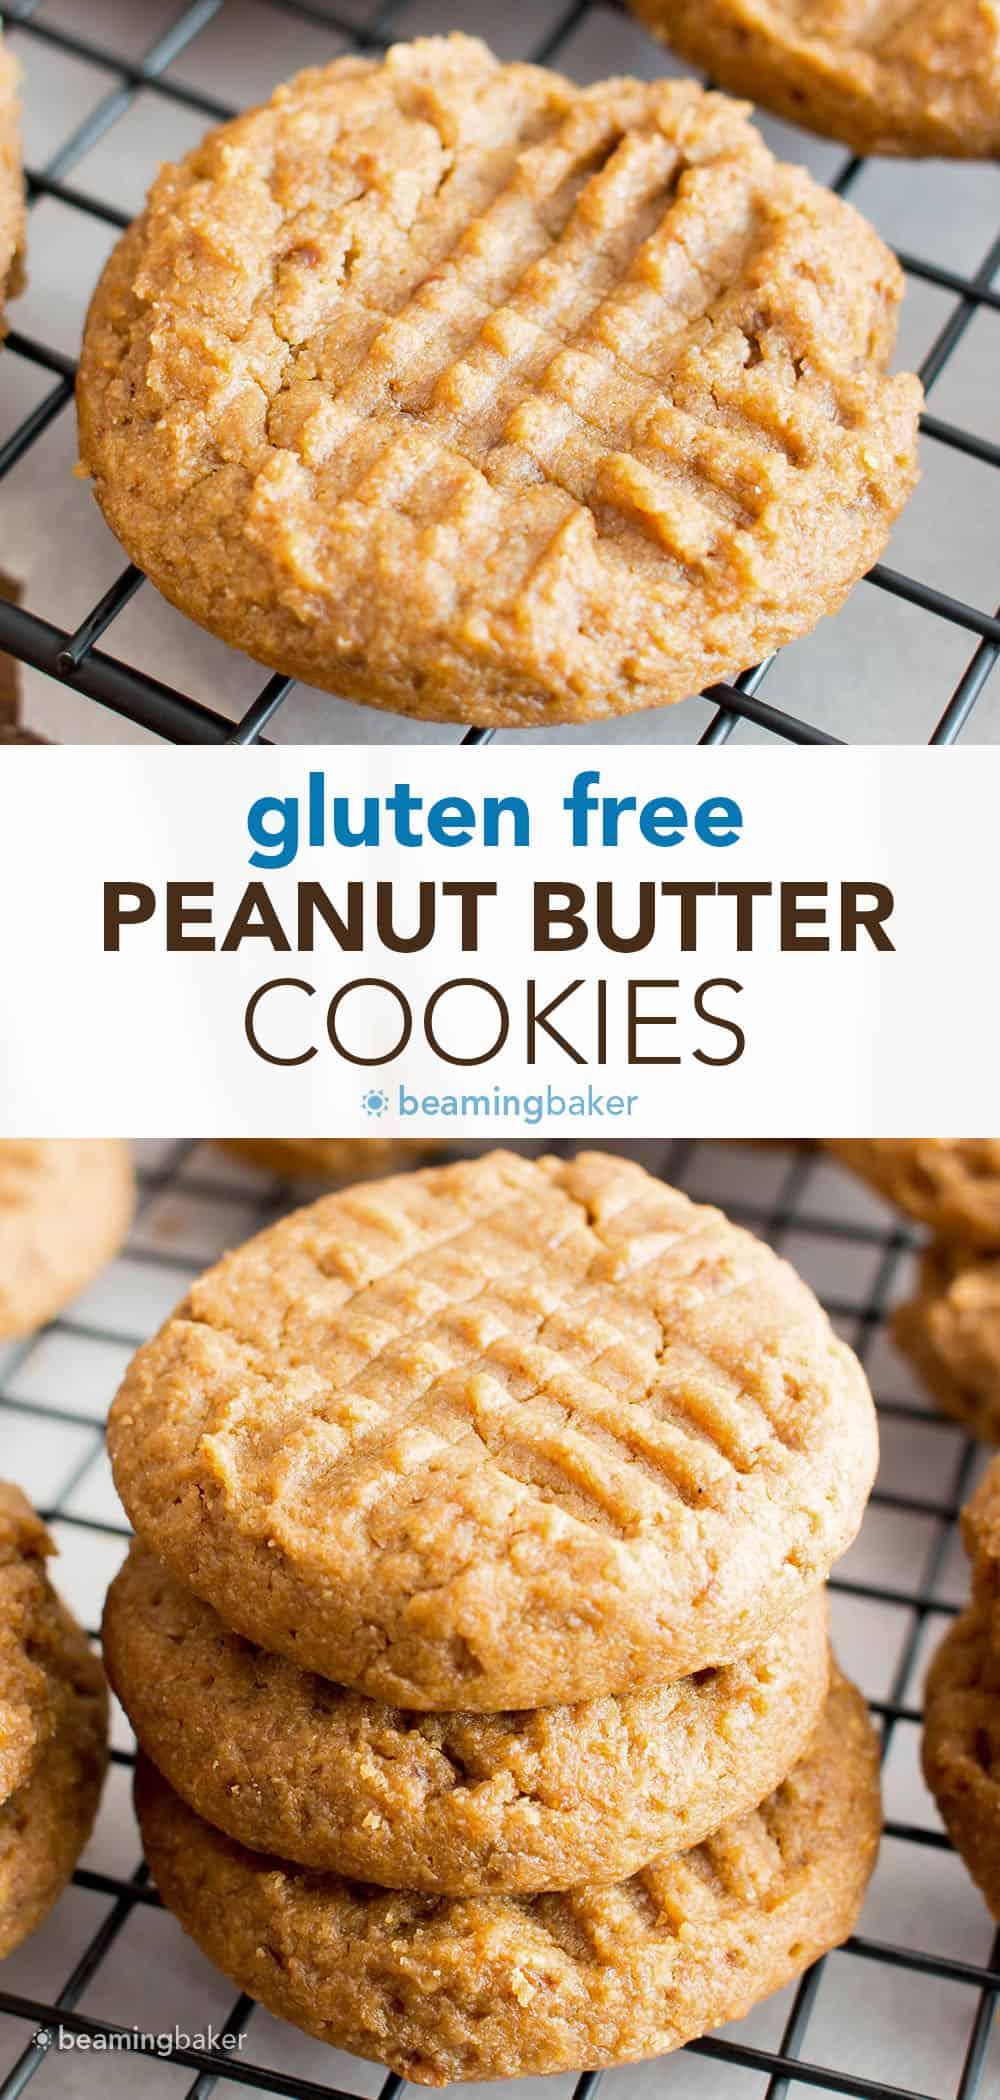 Gluten Free Peanut Butter Cookies: the best delicious and easy gluten free peanut butter cookies—bursting with sweet 'n rich peanut butter flavor! #GlutenFree #PeanutButter #Cookies   Recipe at BeamingBaker.com